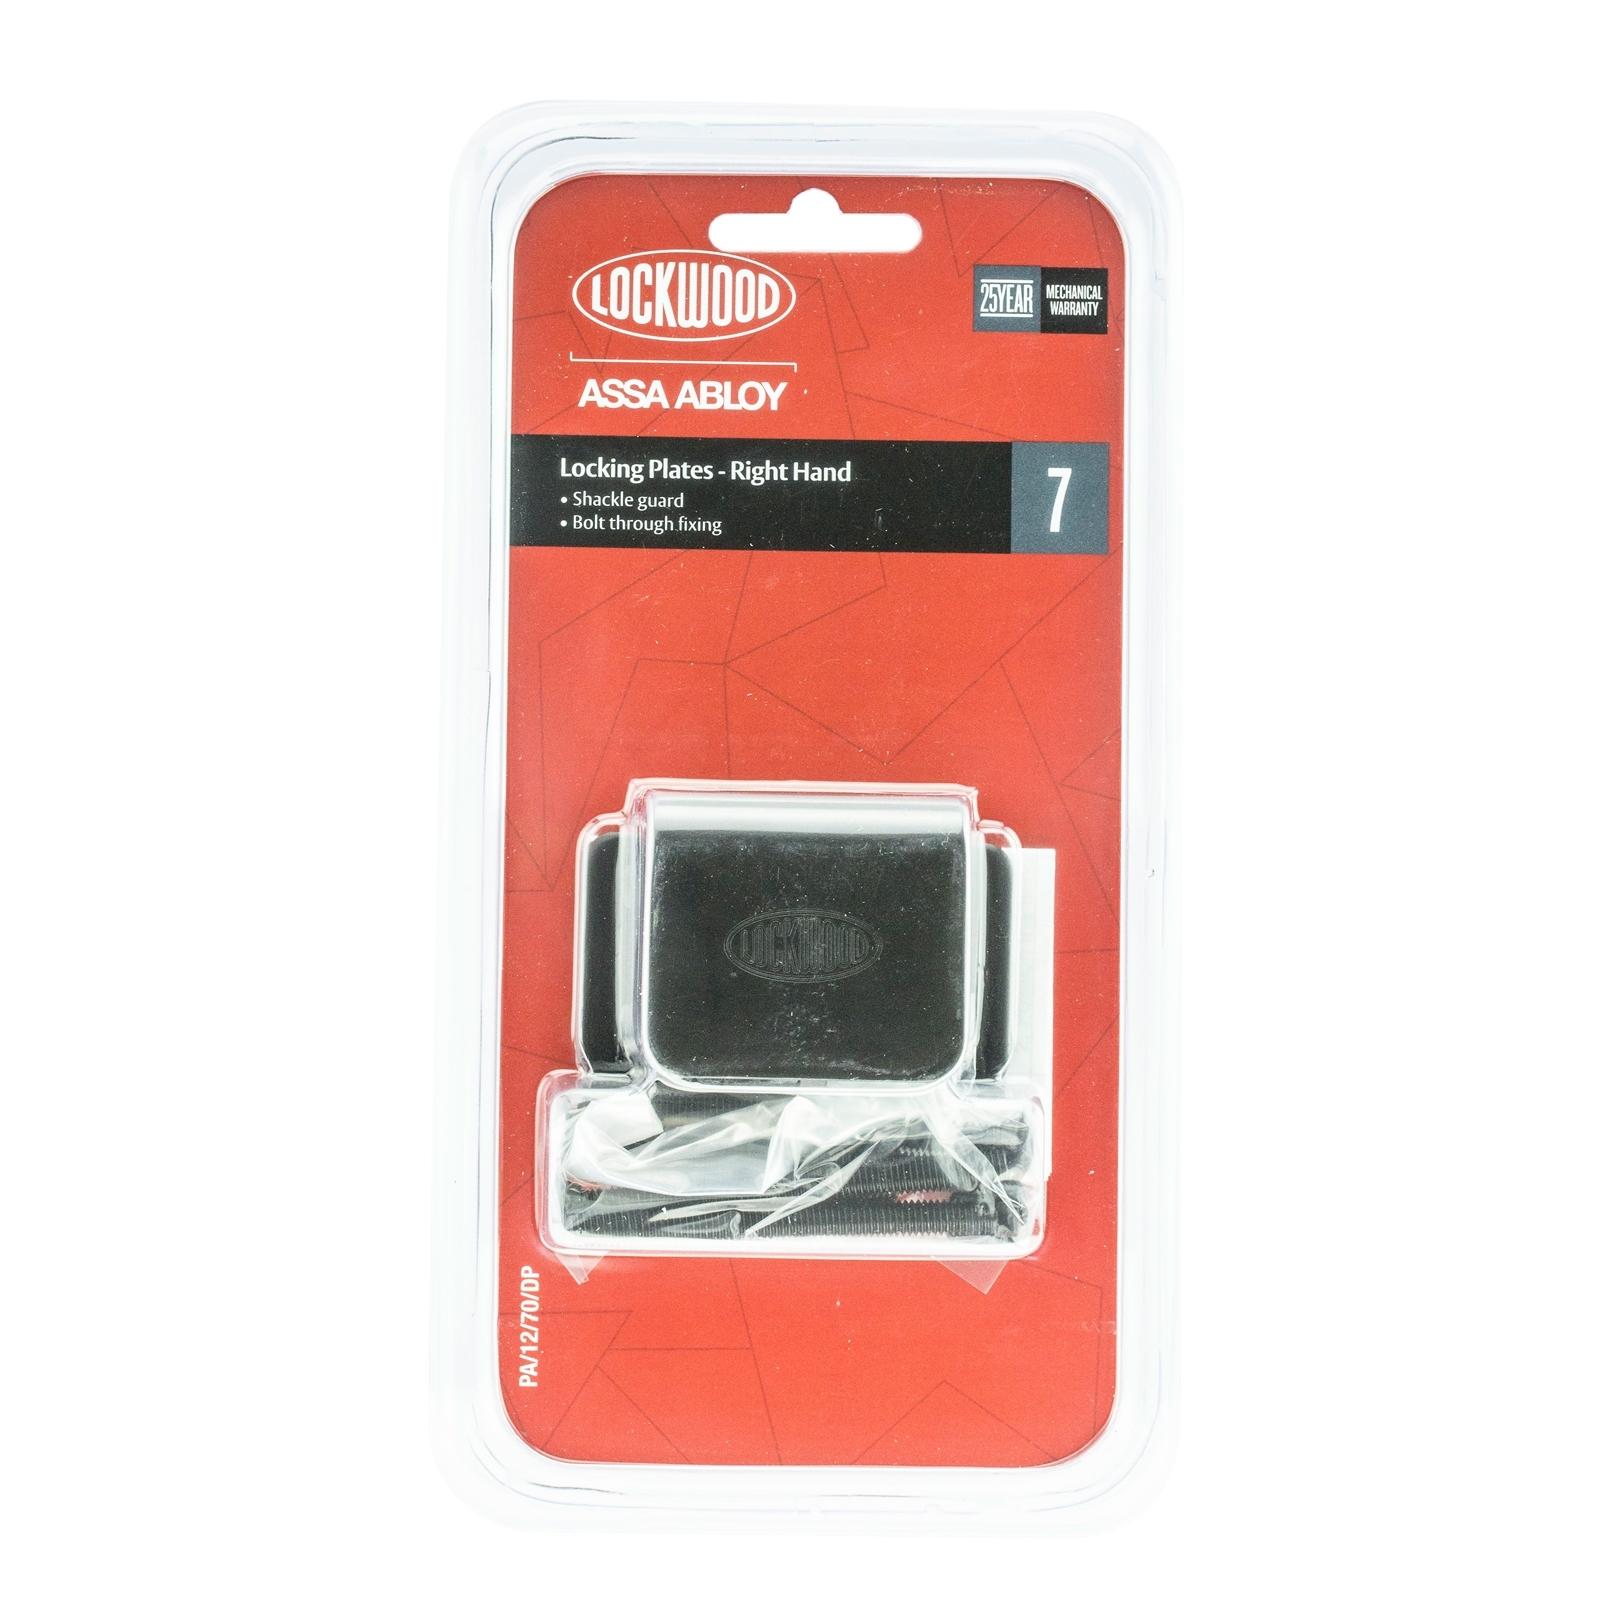 Lockwood 70mm Right Hand Locking Plates